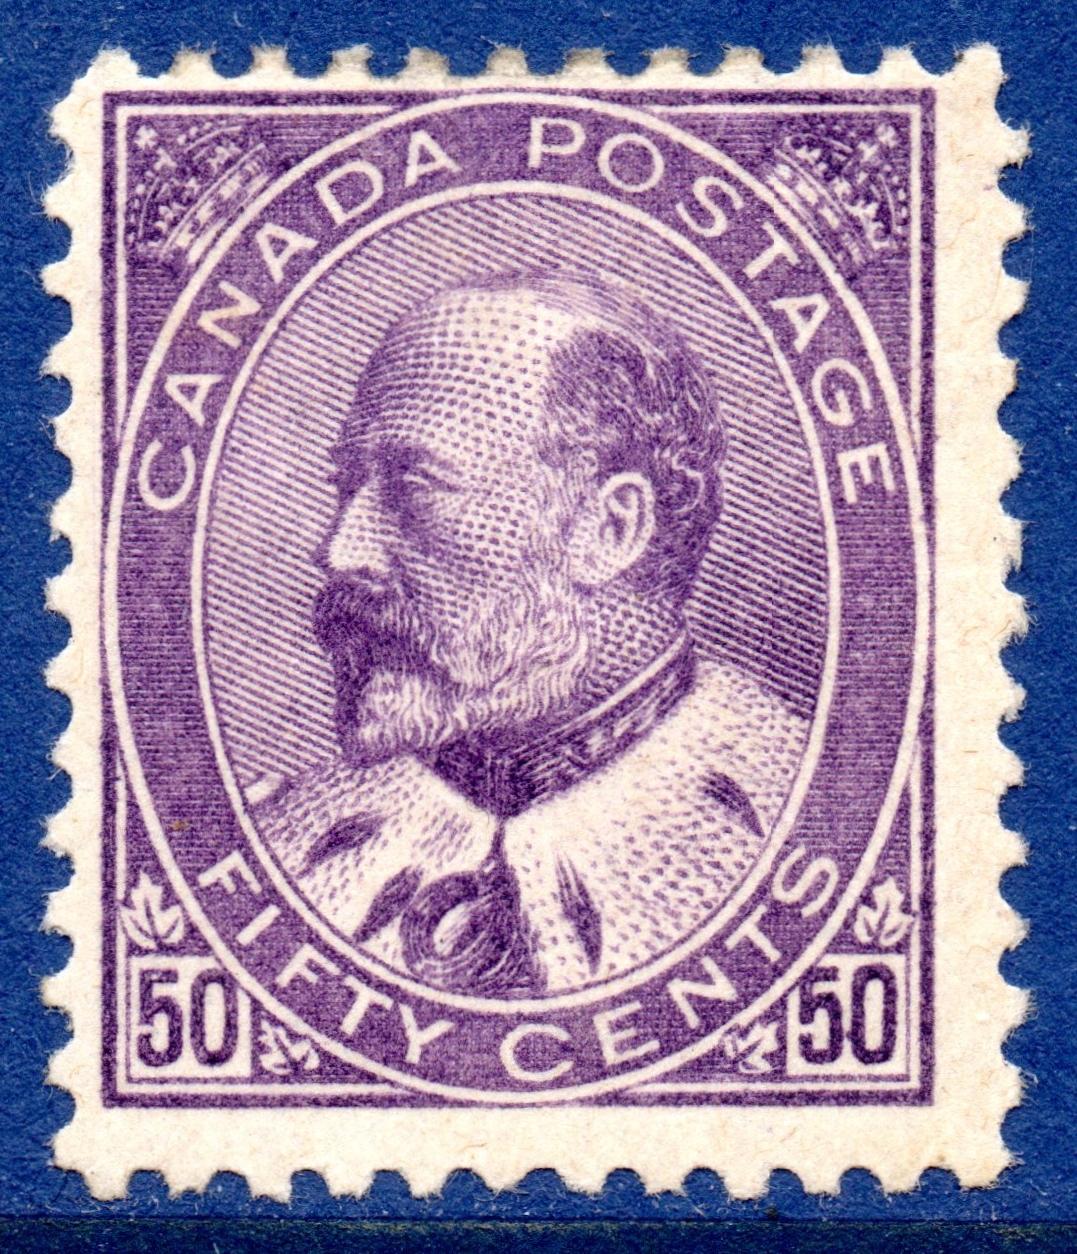 1903 Canada 50c Deep Violet Fine & Fresh Mounted Mint SG187 cat £450 - Scott #95